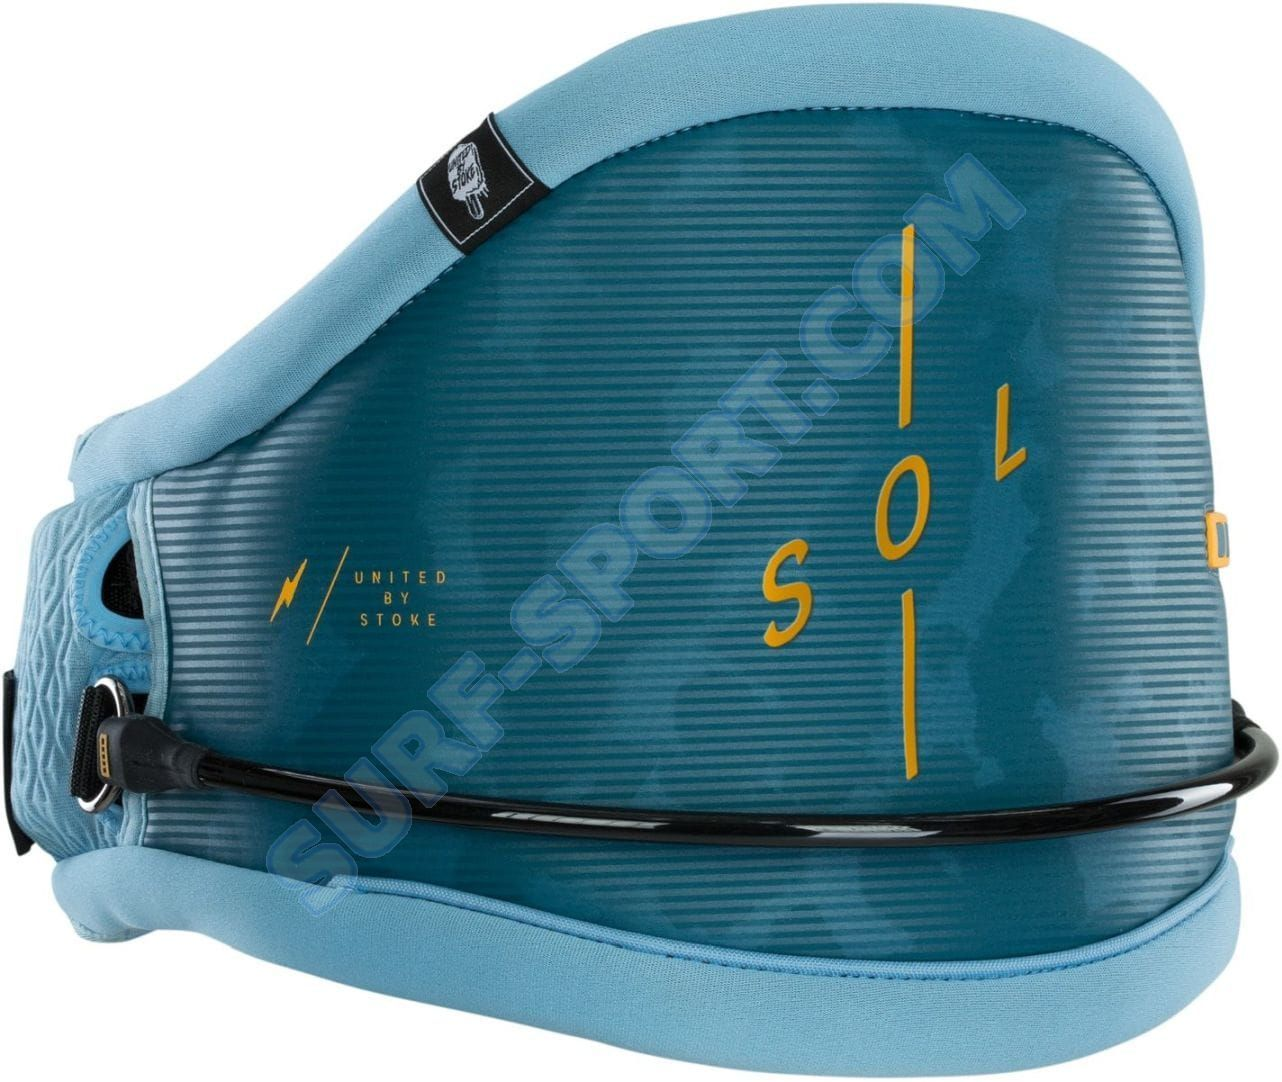 Trapez Ion Sol 7 Kite Waist 2020 Sky Blue